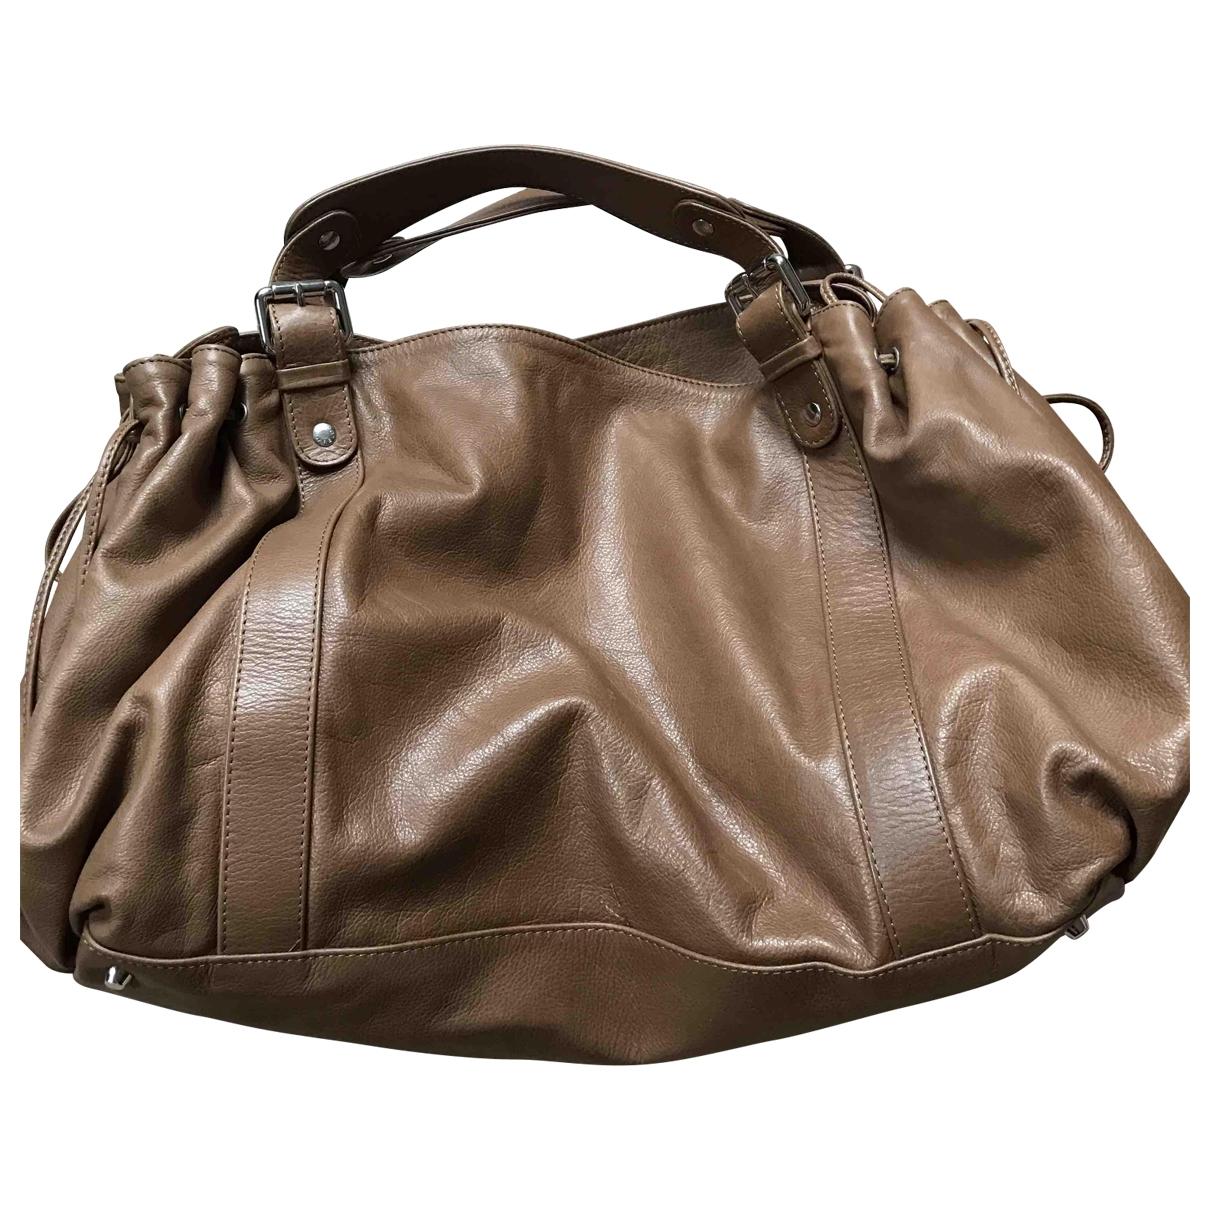 Gerard Darel 36 H Beige Leather handbag for Women \N